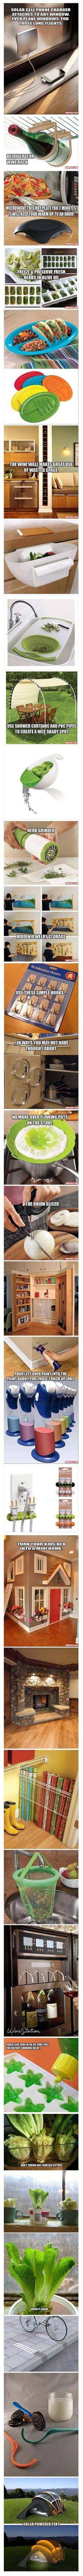 Amazing ideas full of awesome